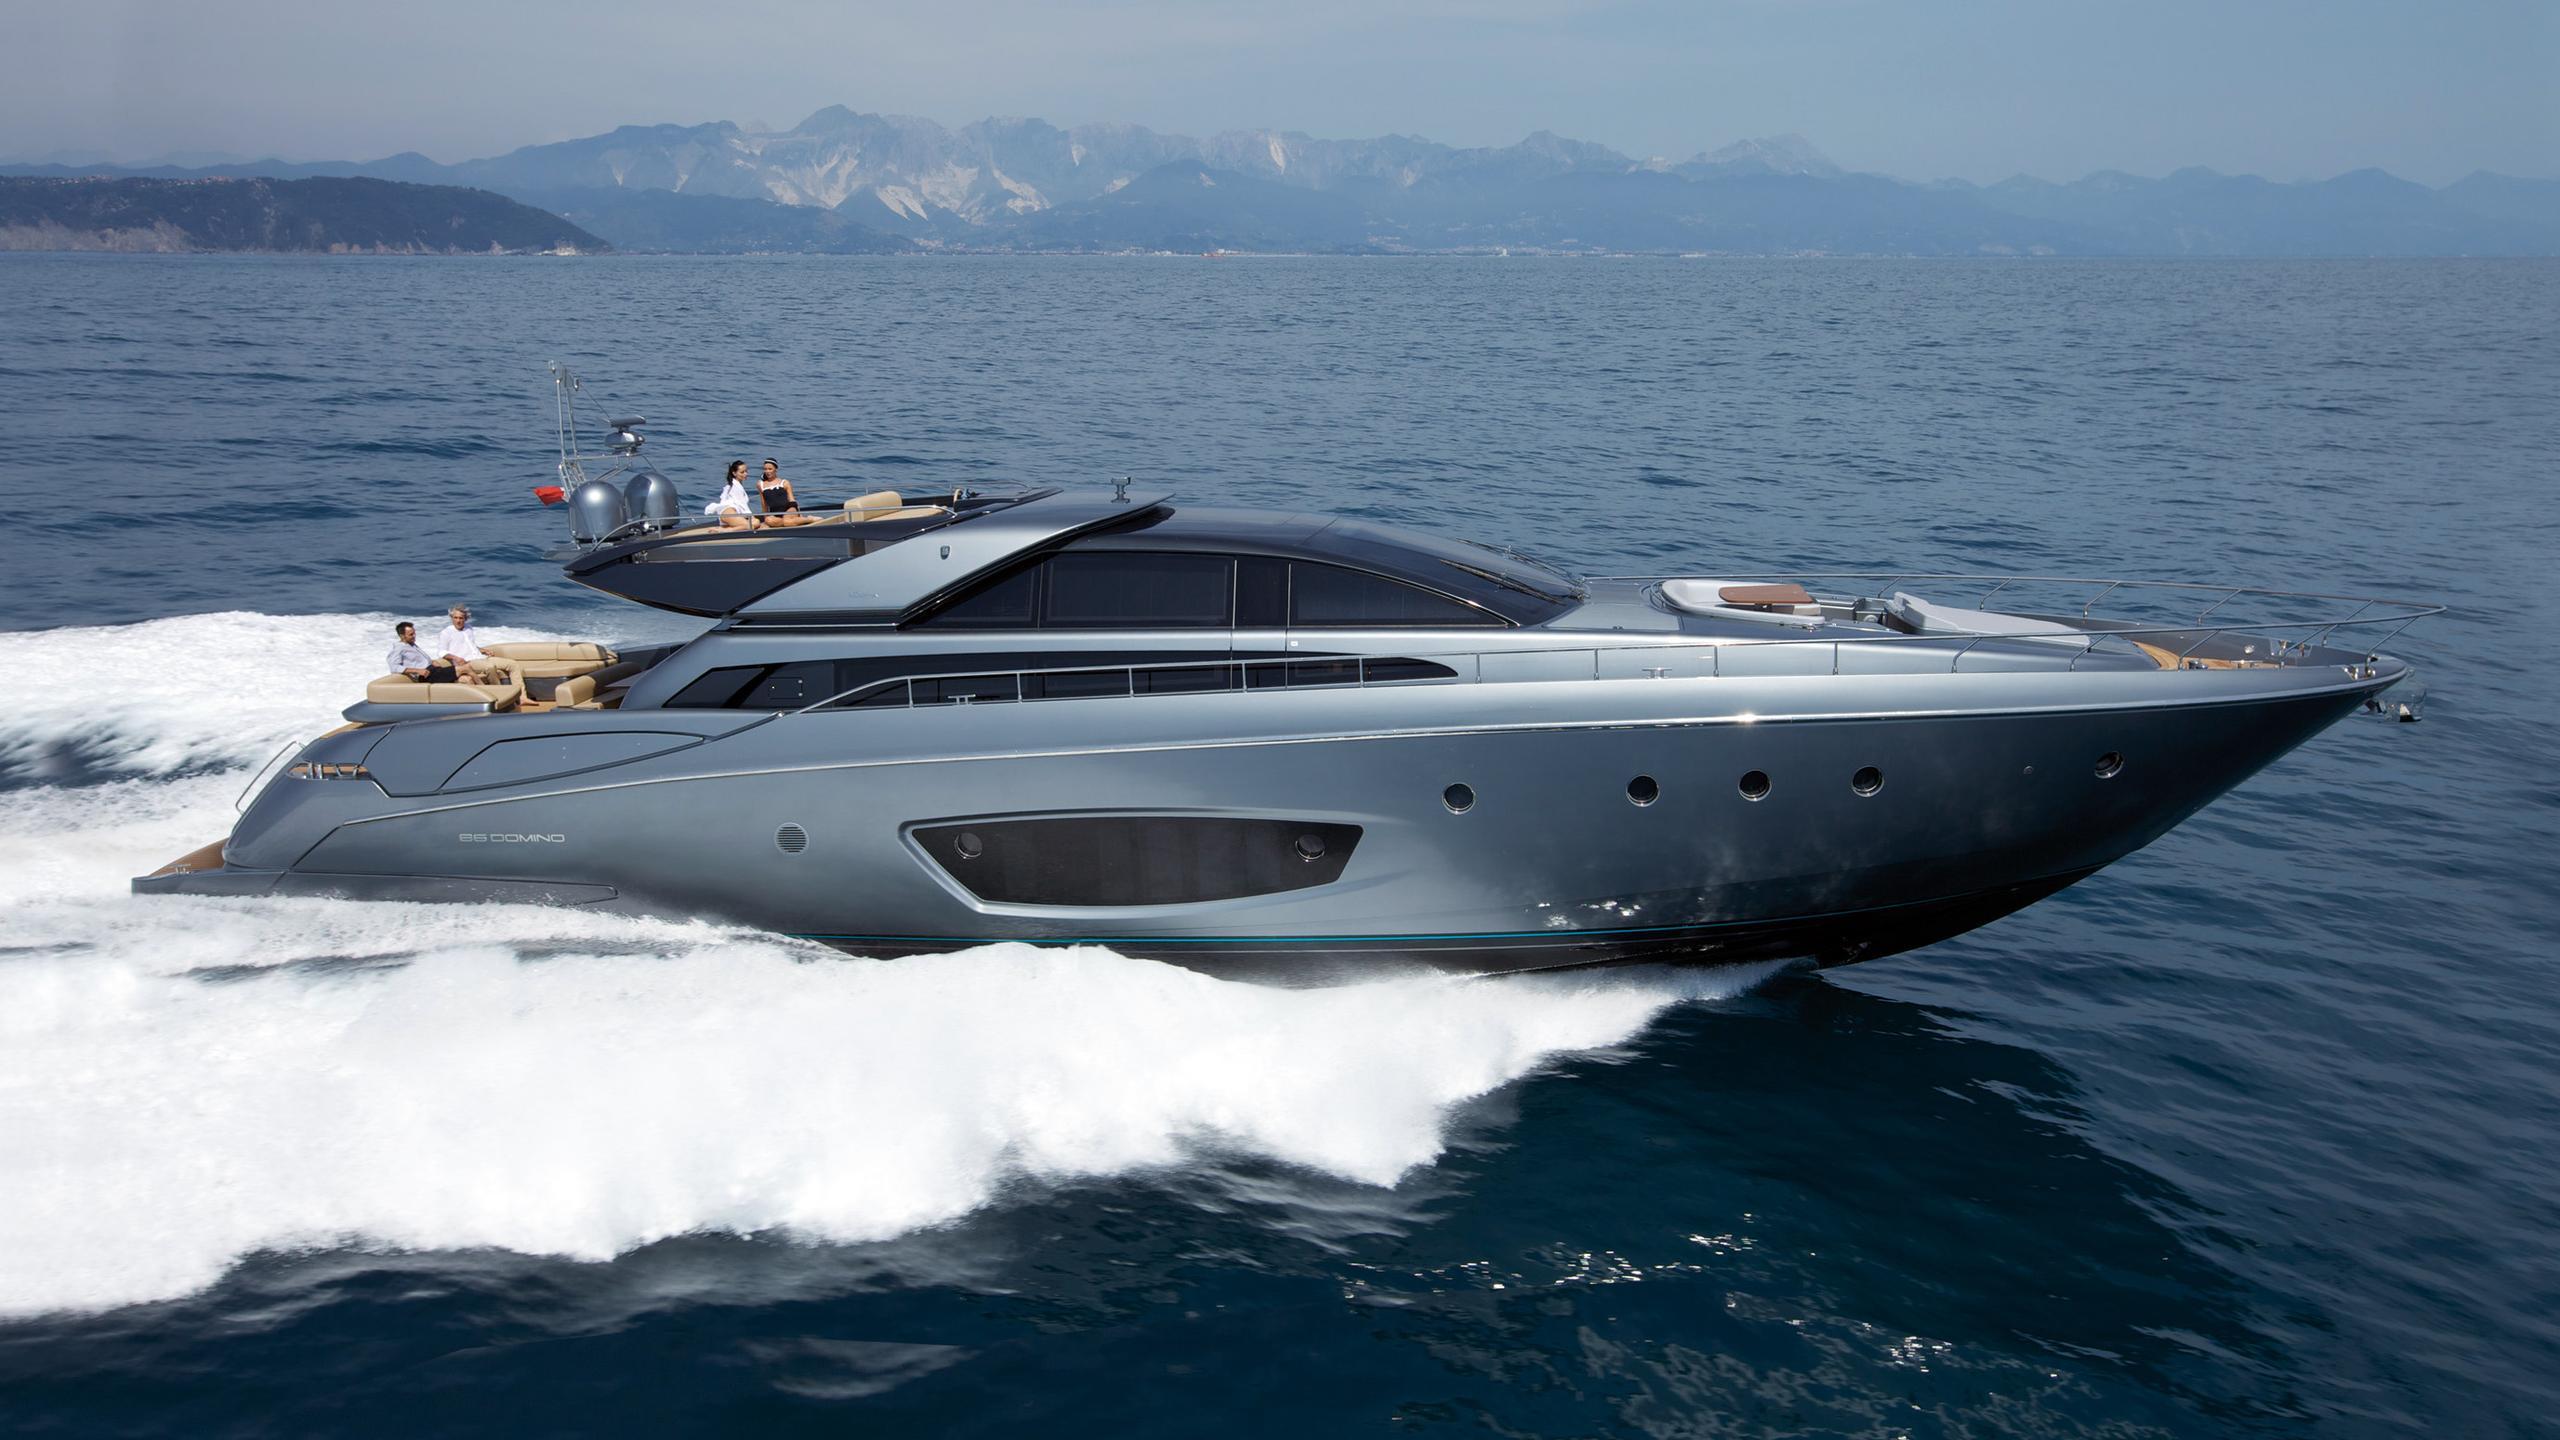 da rose riva 86 domino motoryacht 2012 26m cruising sistership